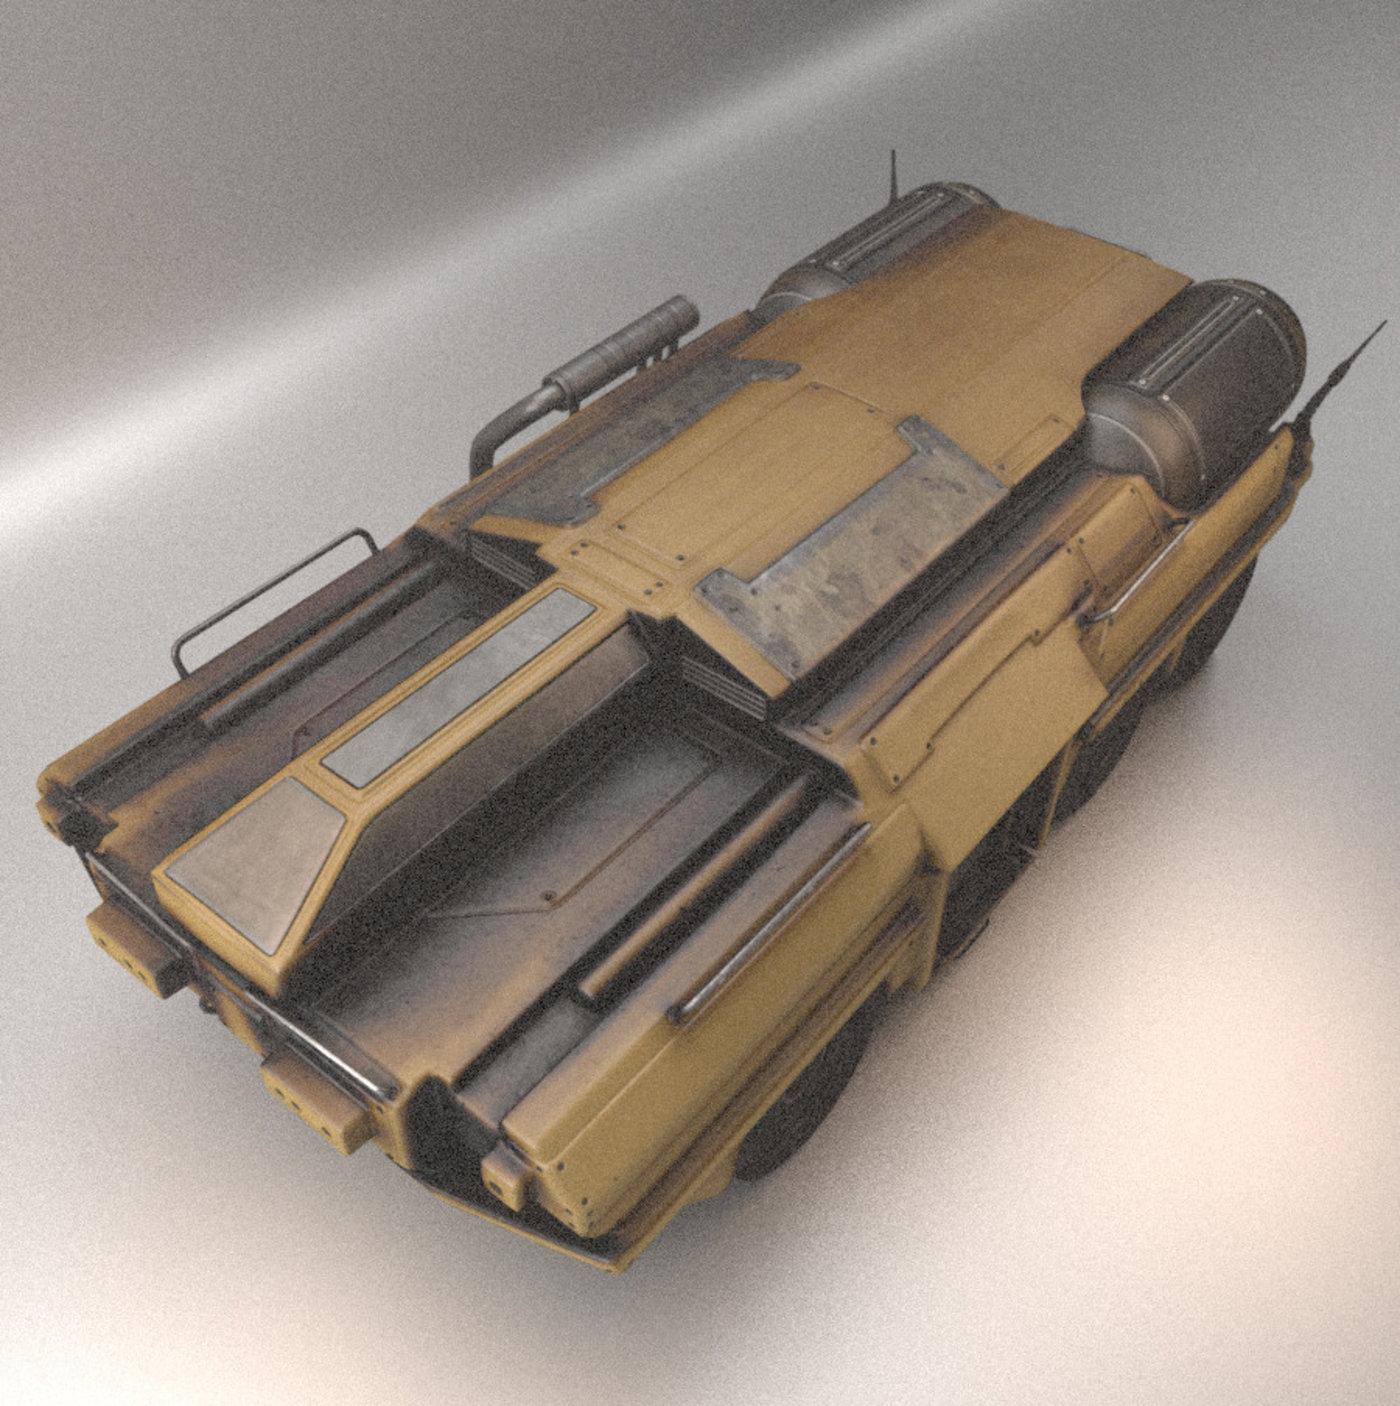 Six Wheeled Amphibious Tank Design